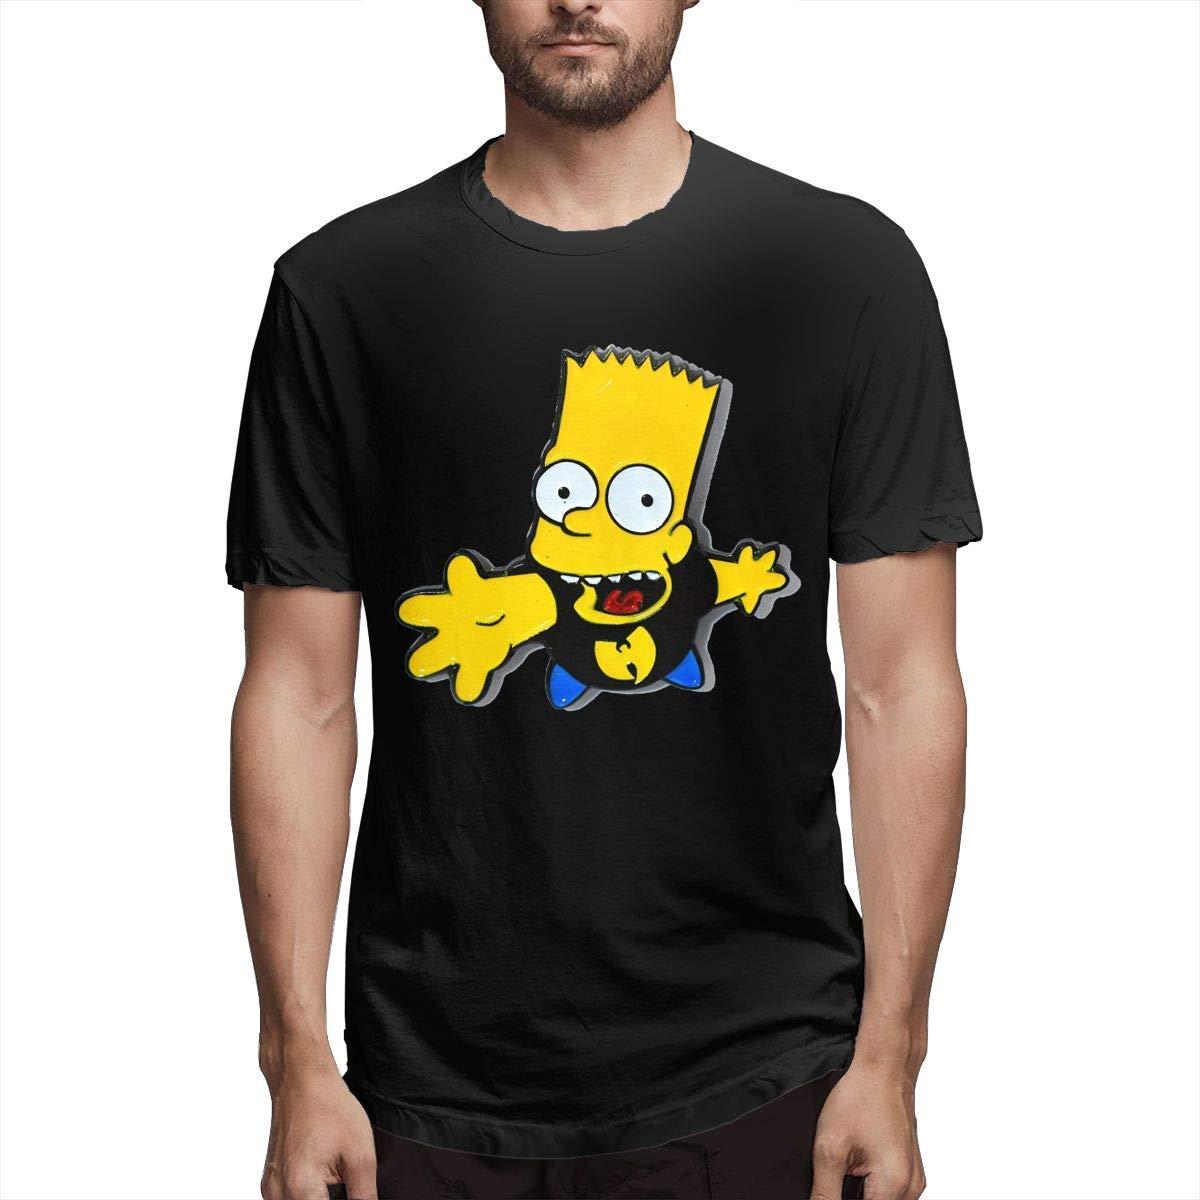 T-shirts preto unisex das mulheres dos homens de tsdfc bart simpson